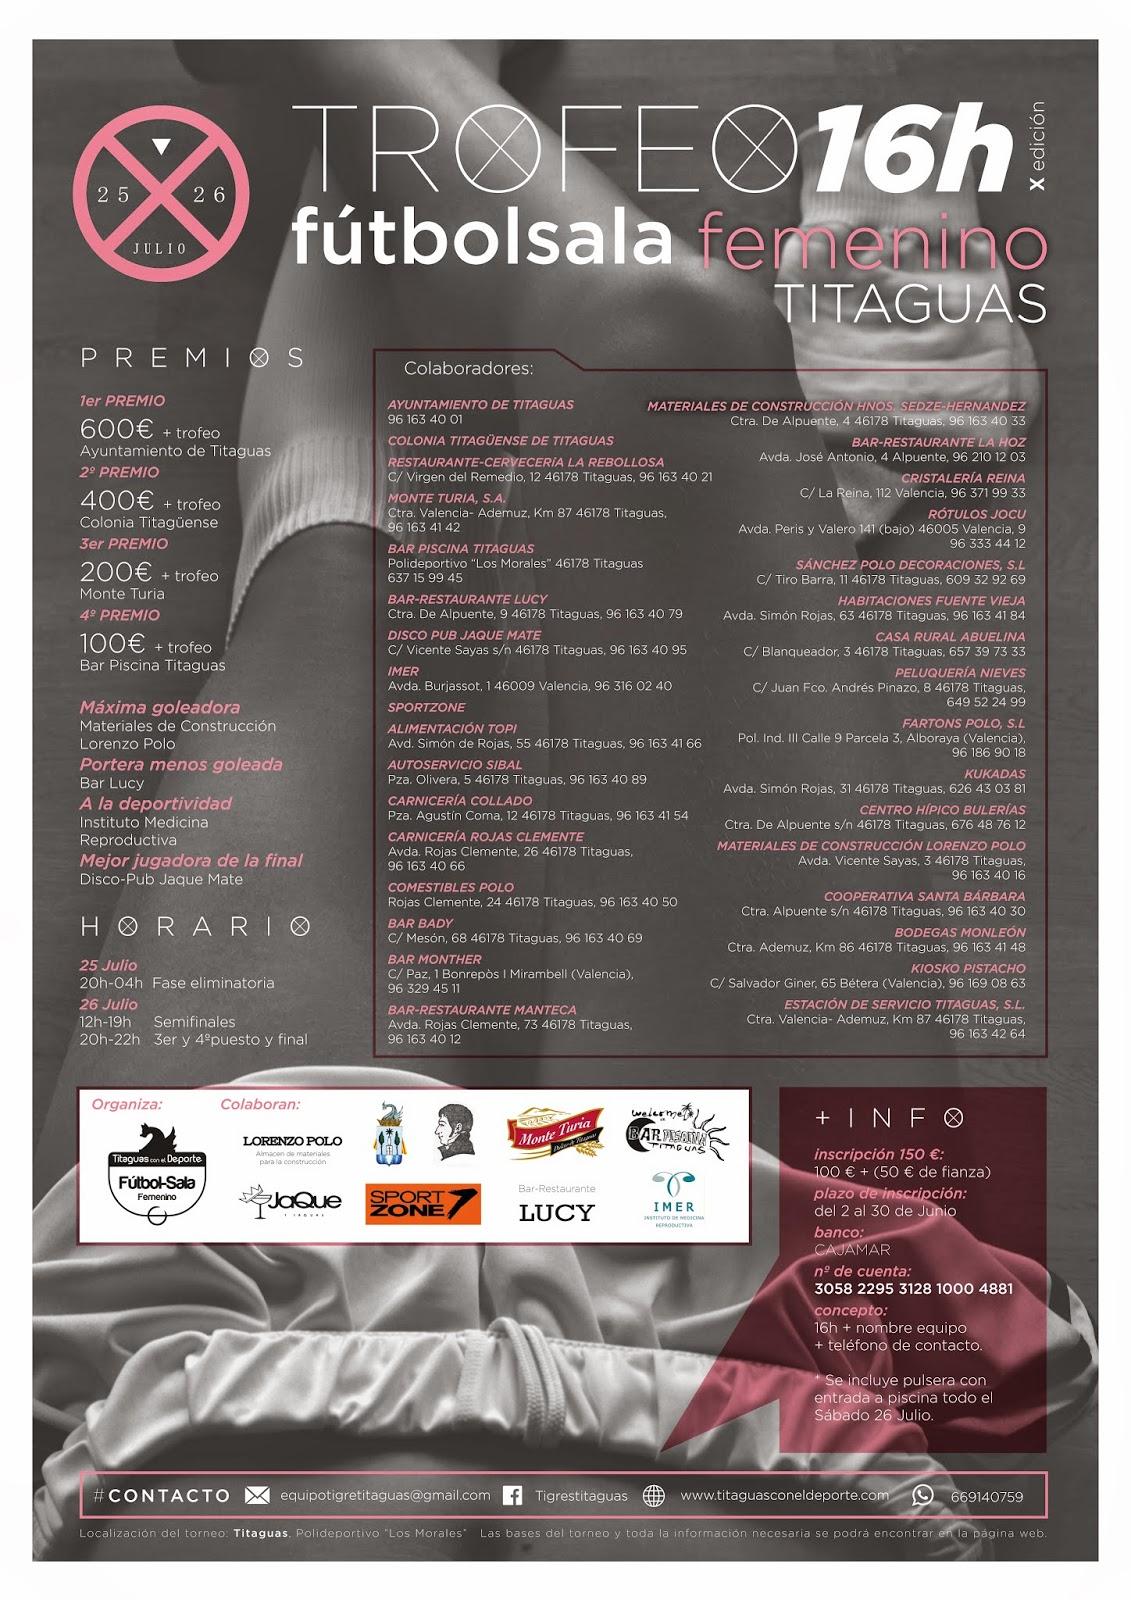 http://www.titaguasconeldeporte.com/p/x-trofeo.html